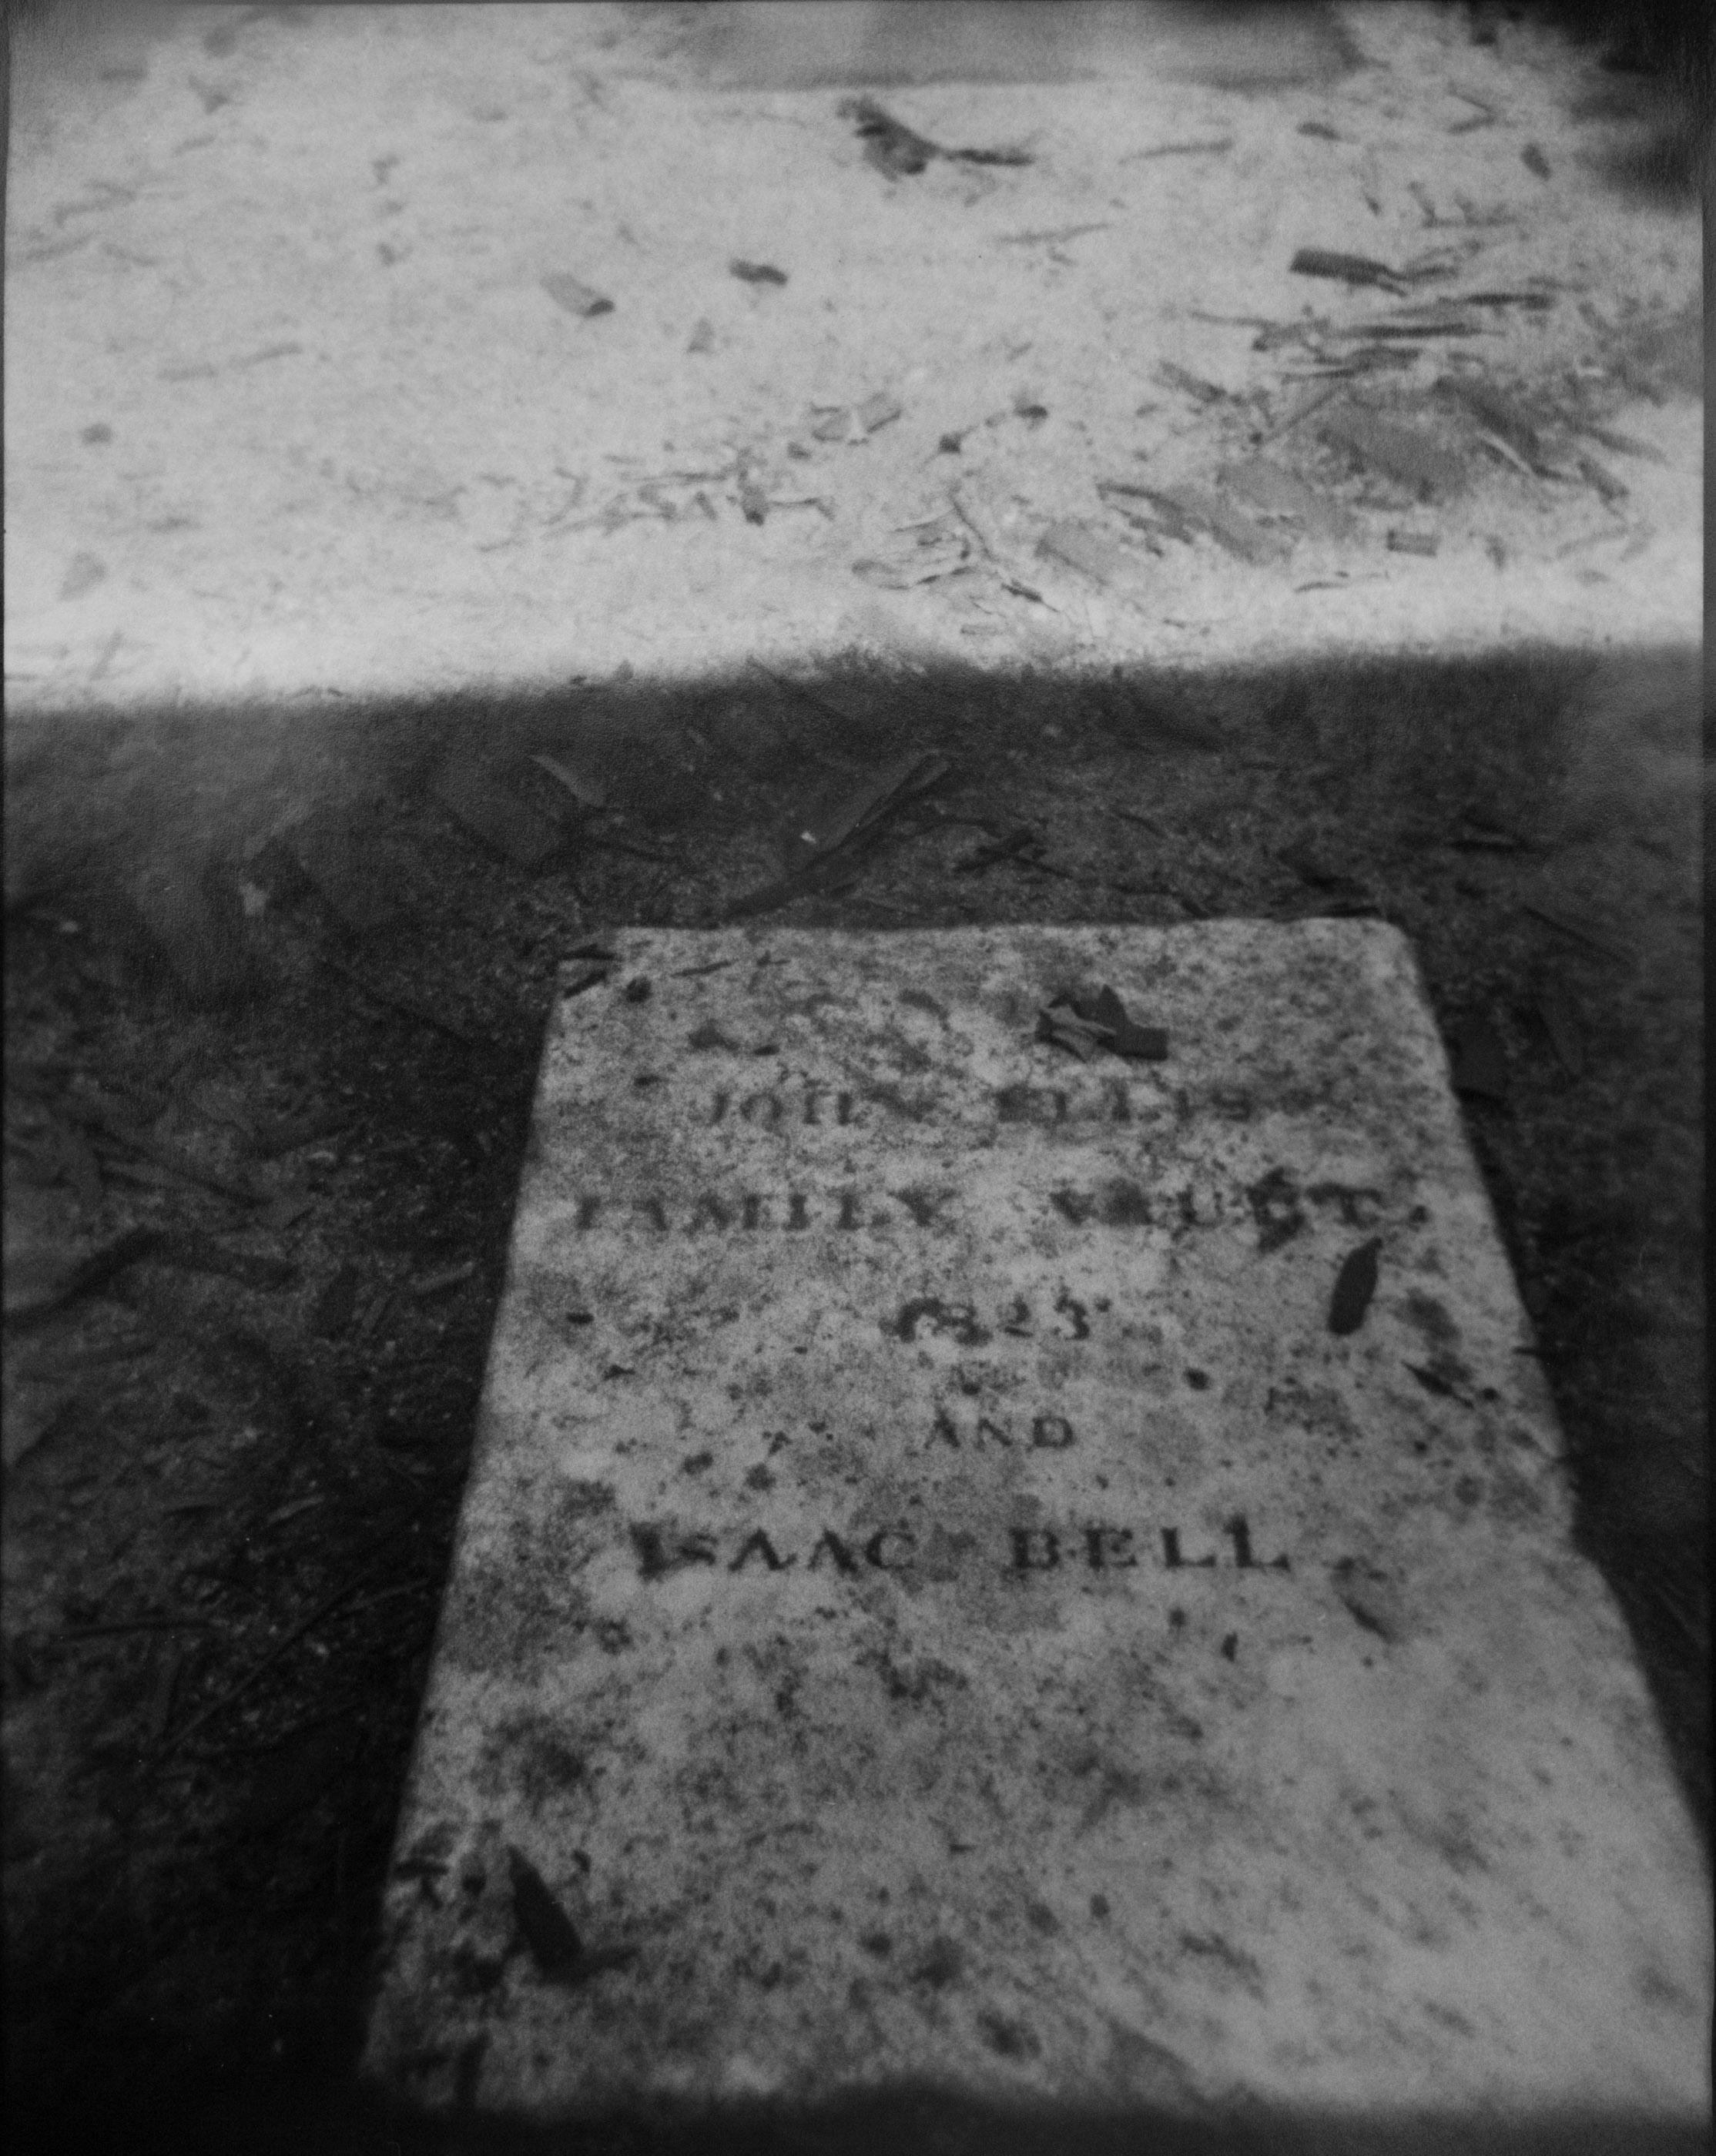 8_Grave Ground_St. Mark's Church-in-the-Bowerie, 1999-2000_.jpg